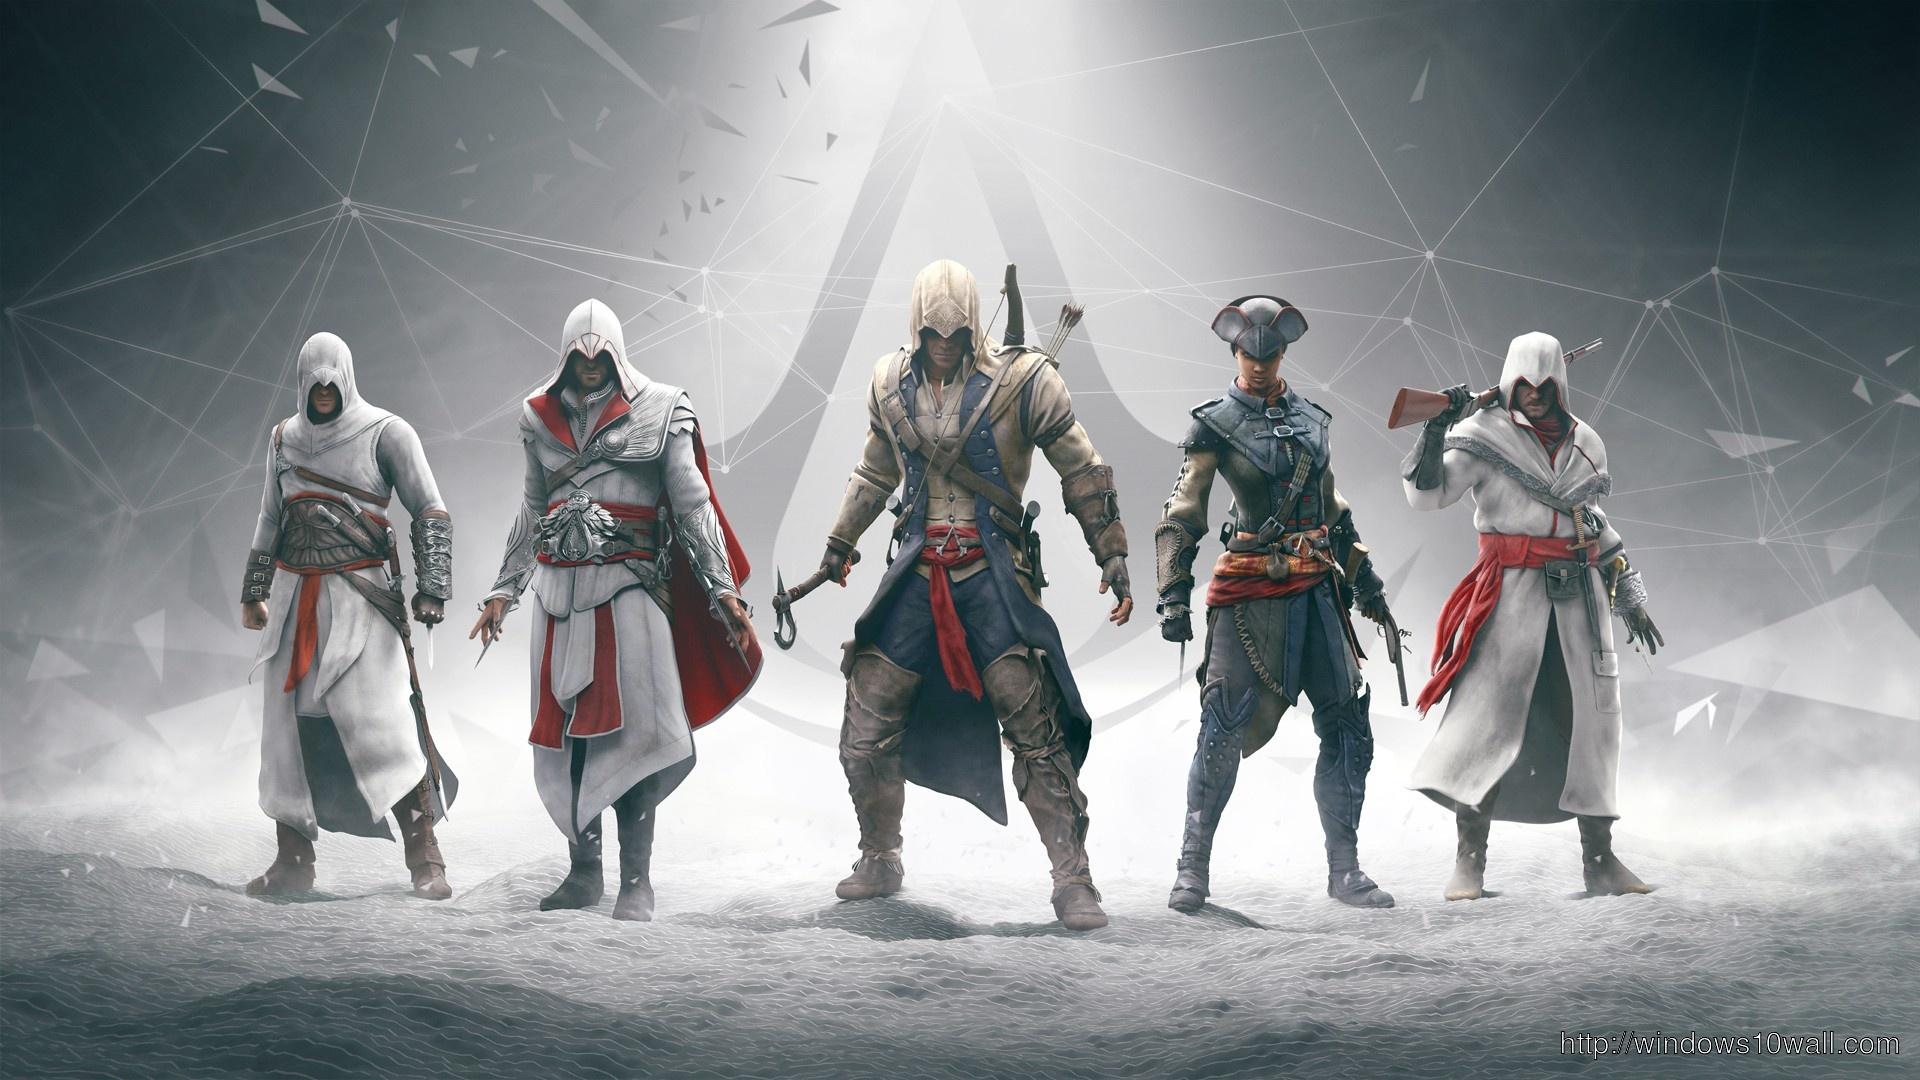 Hd Assassins Creed Background Wallpaper Windows 10 Wallpapers